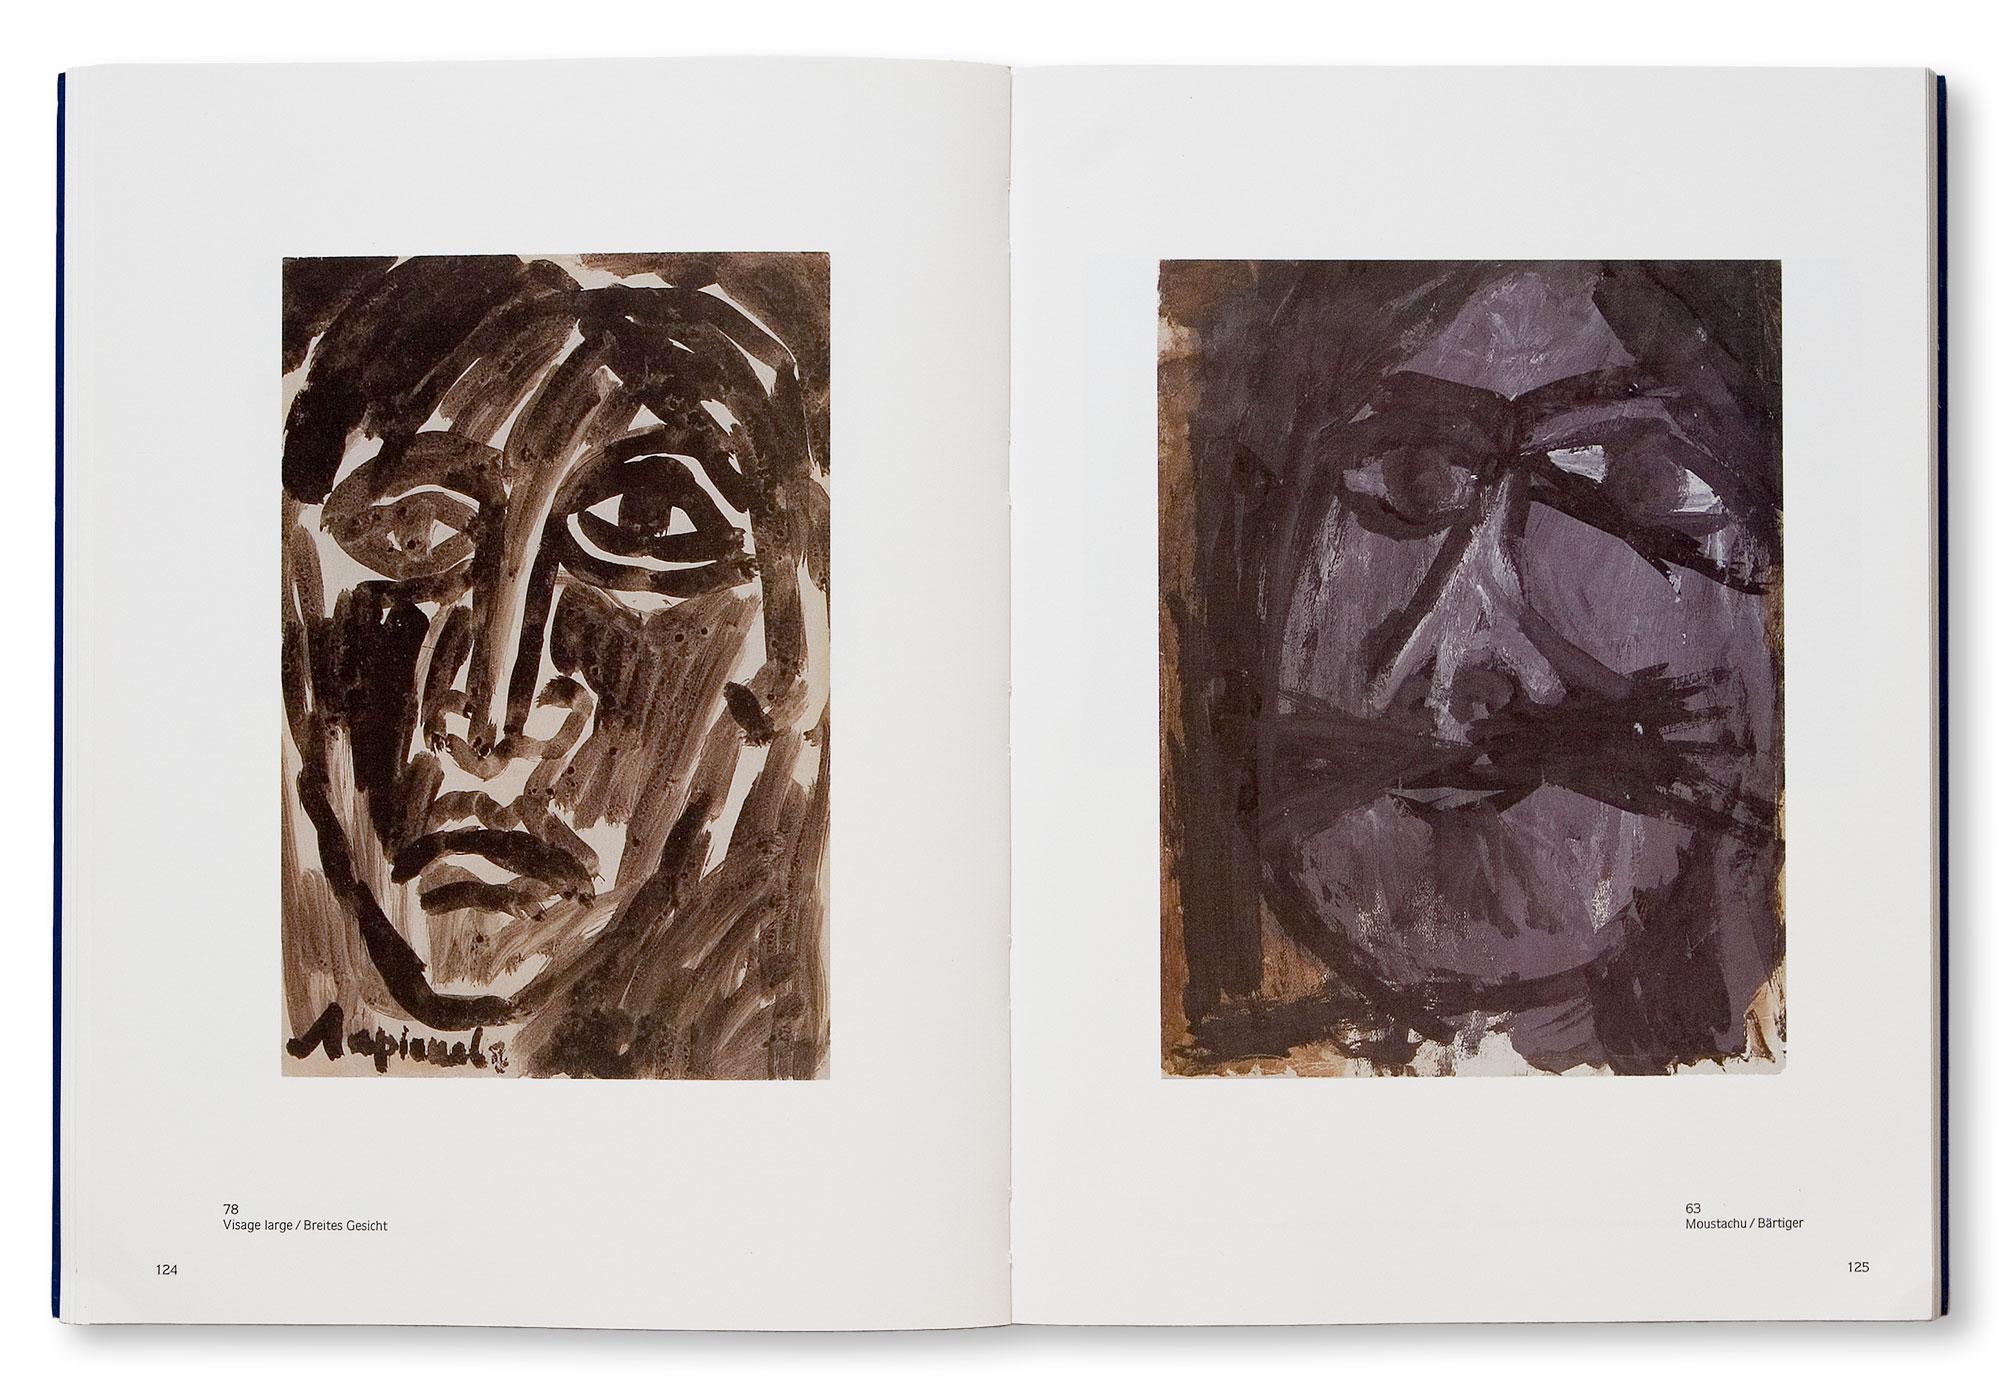 Catalogue, p124